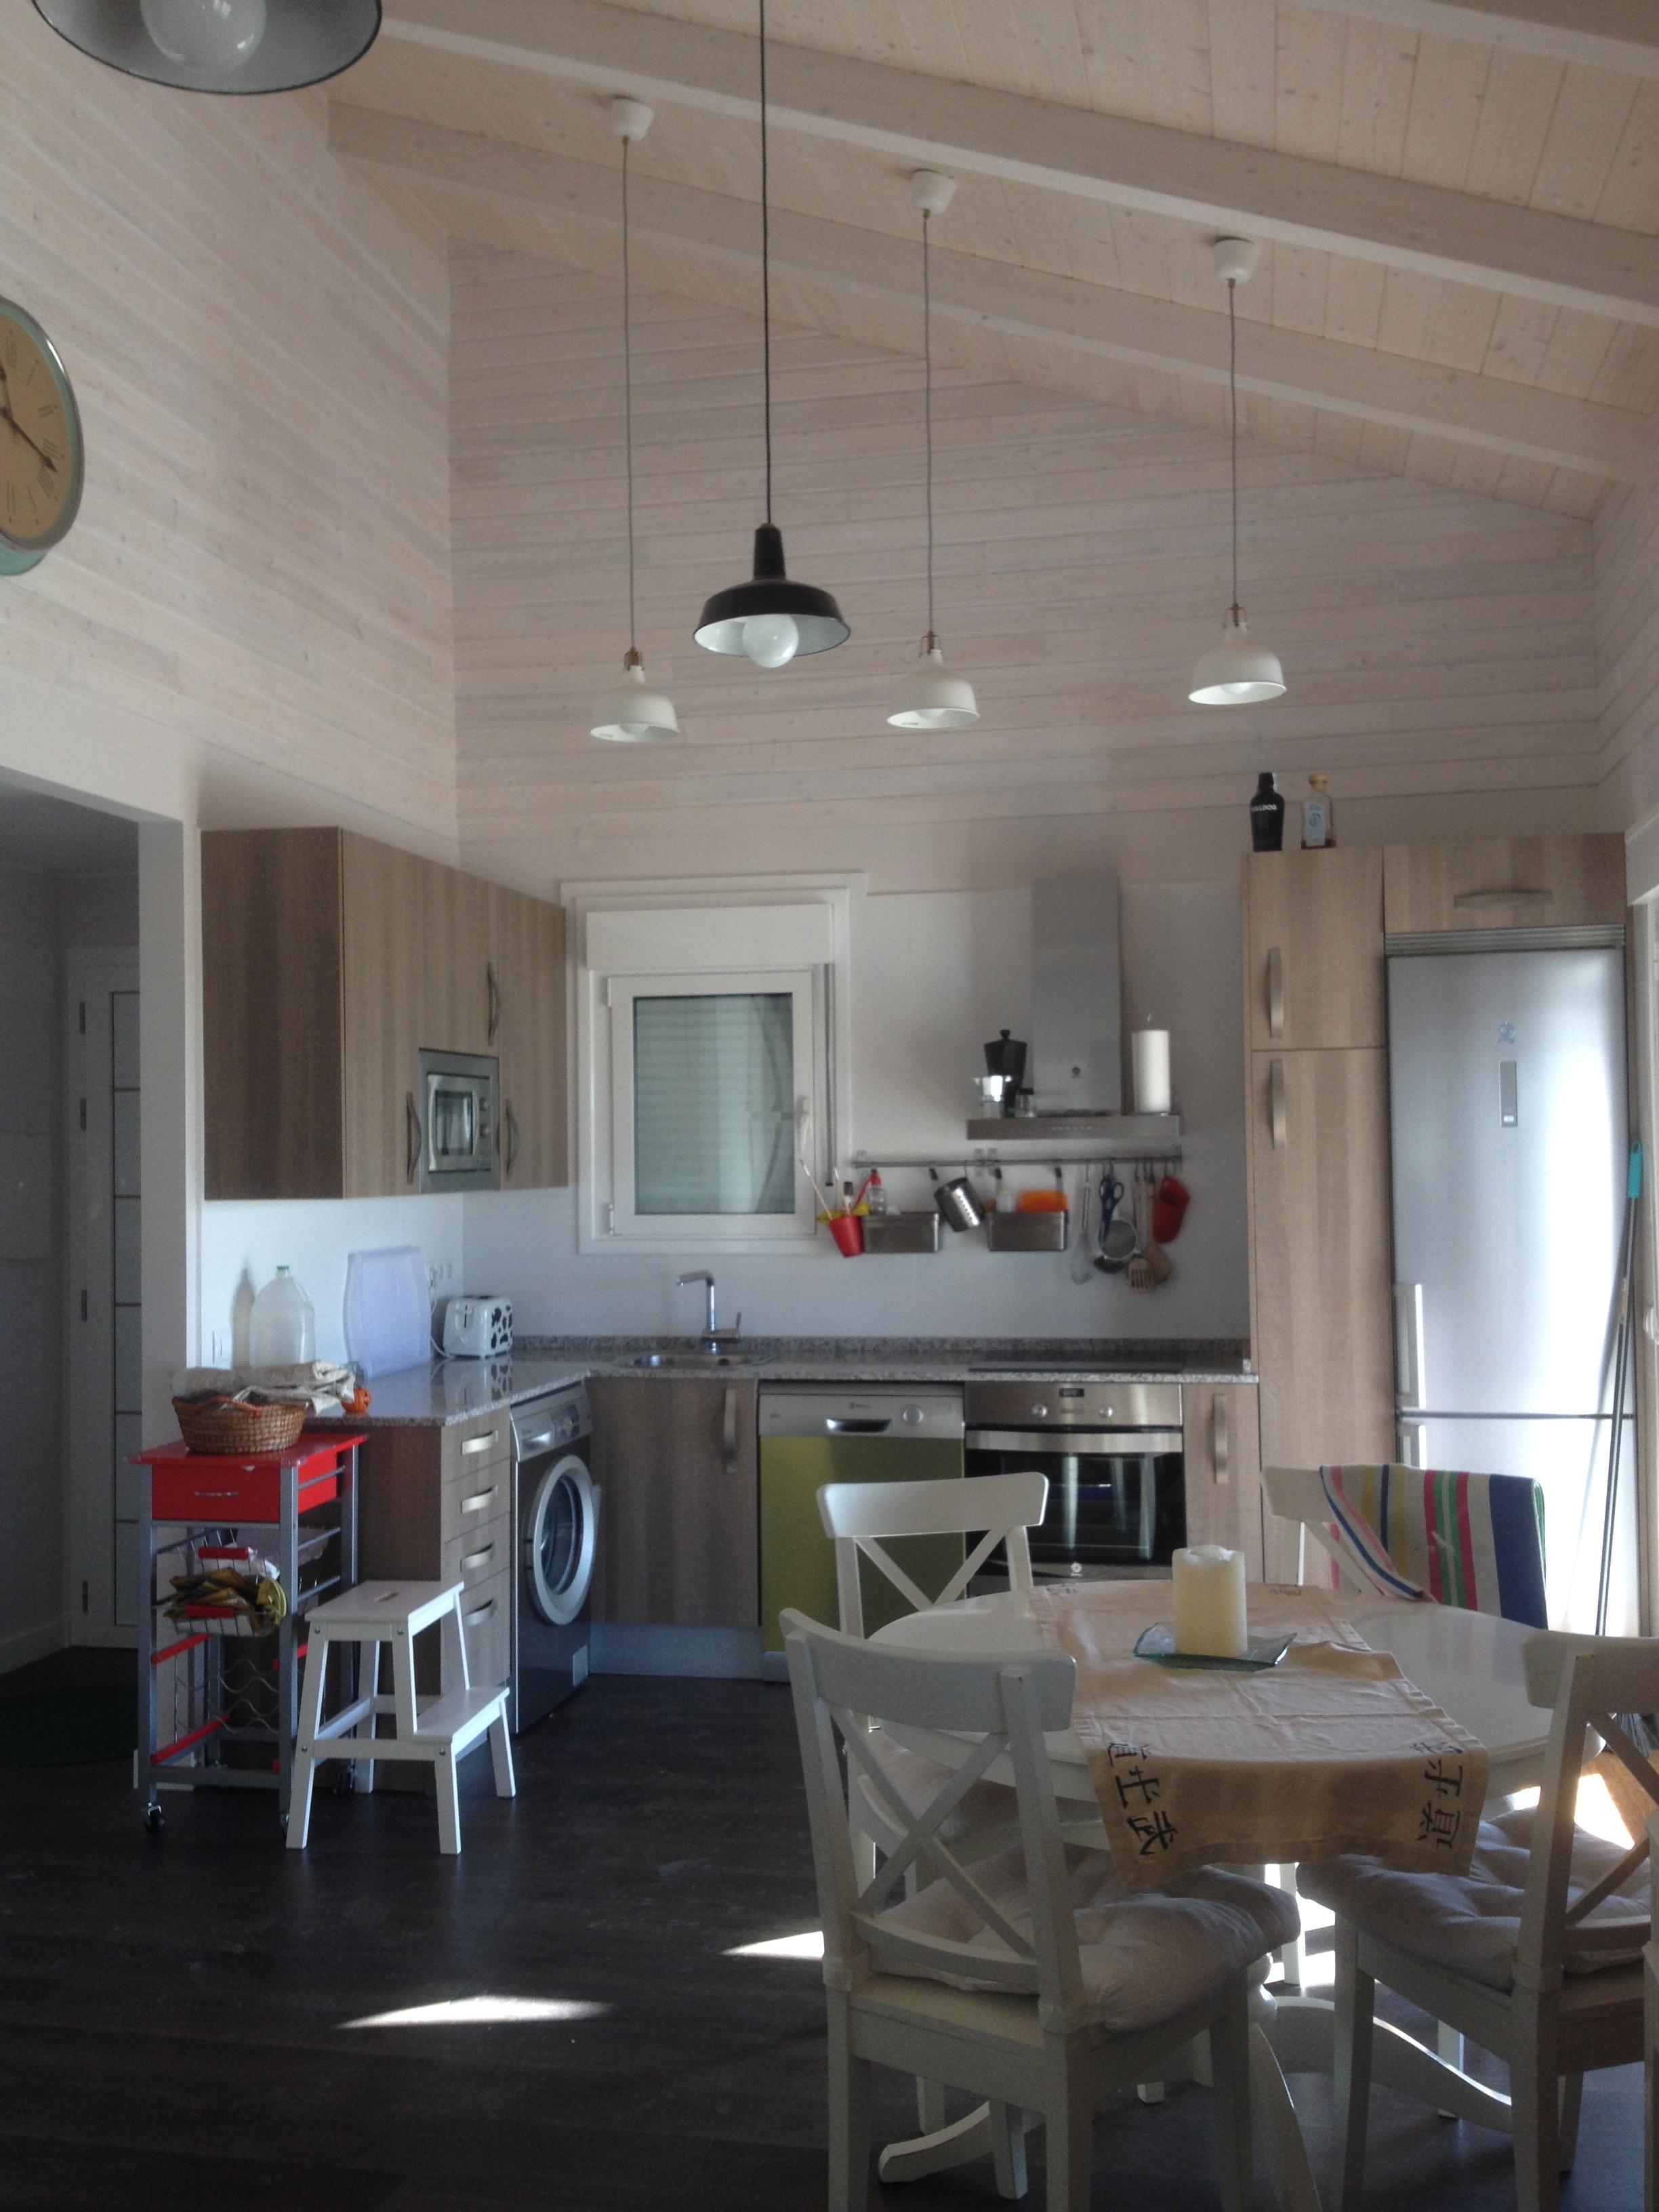 Fotos interiores de casas de madera canadienses for Fotos de interiores de casas